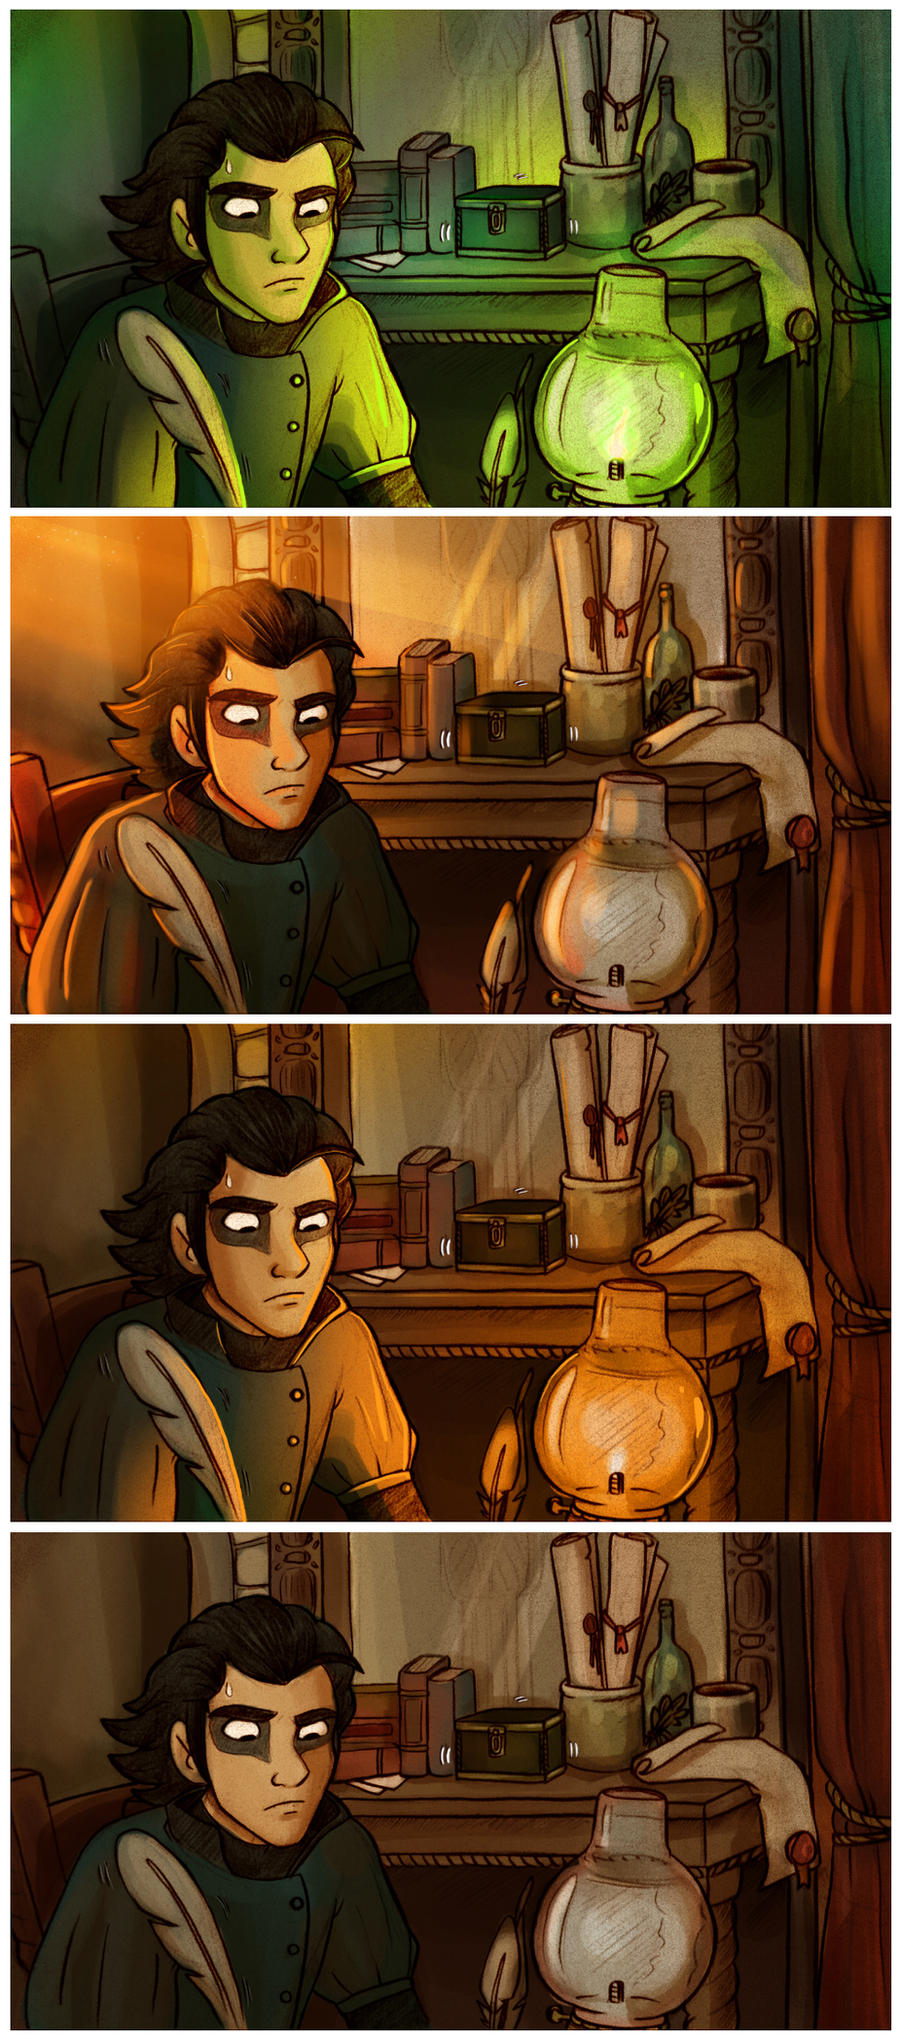 Mias in his study: Light studies by StressedJenny